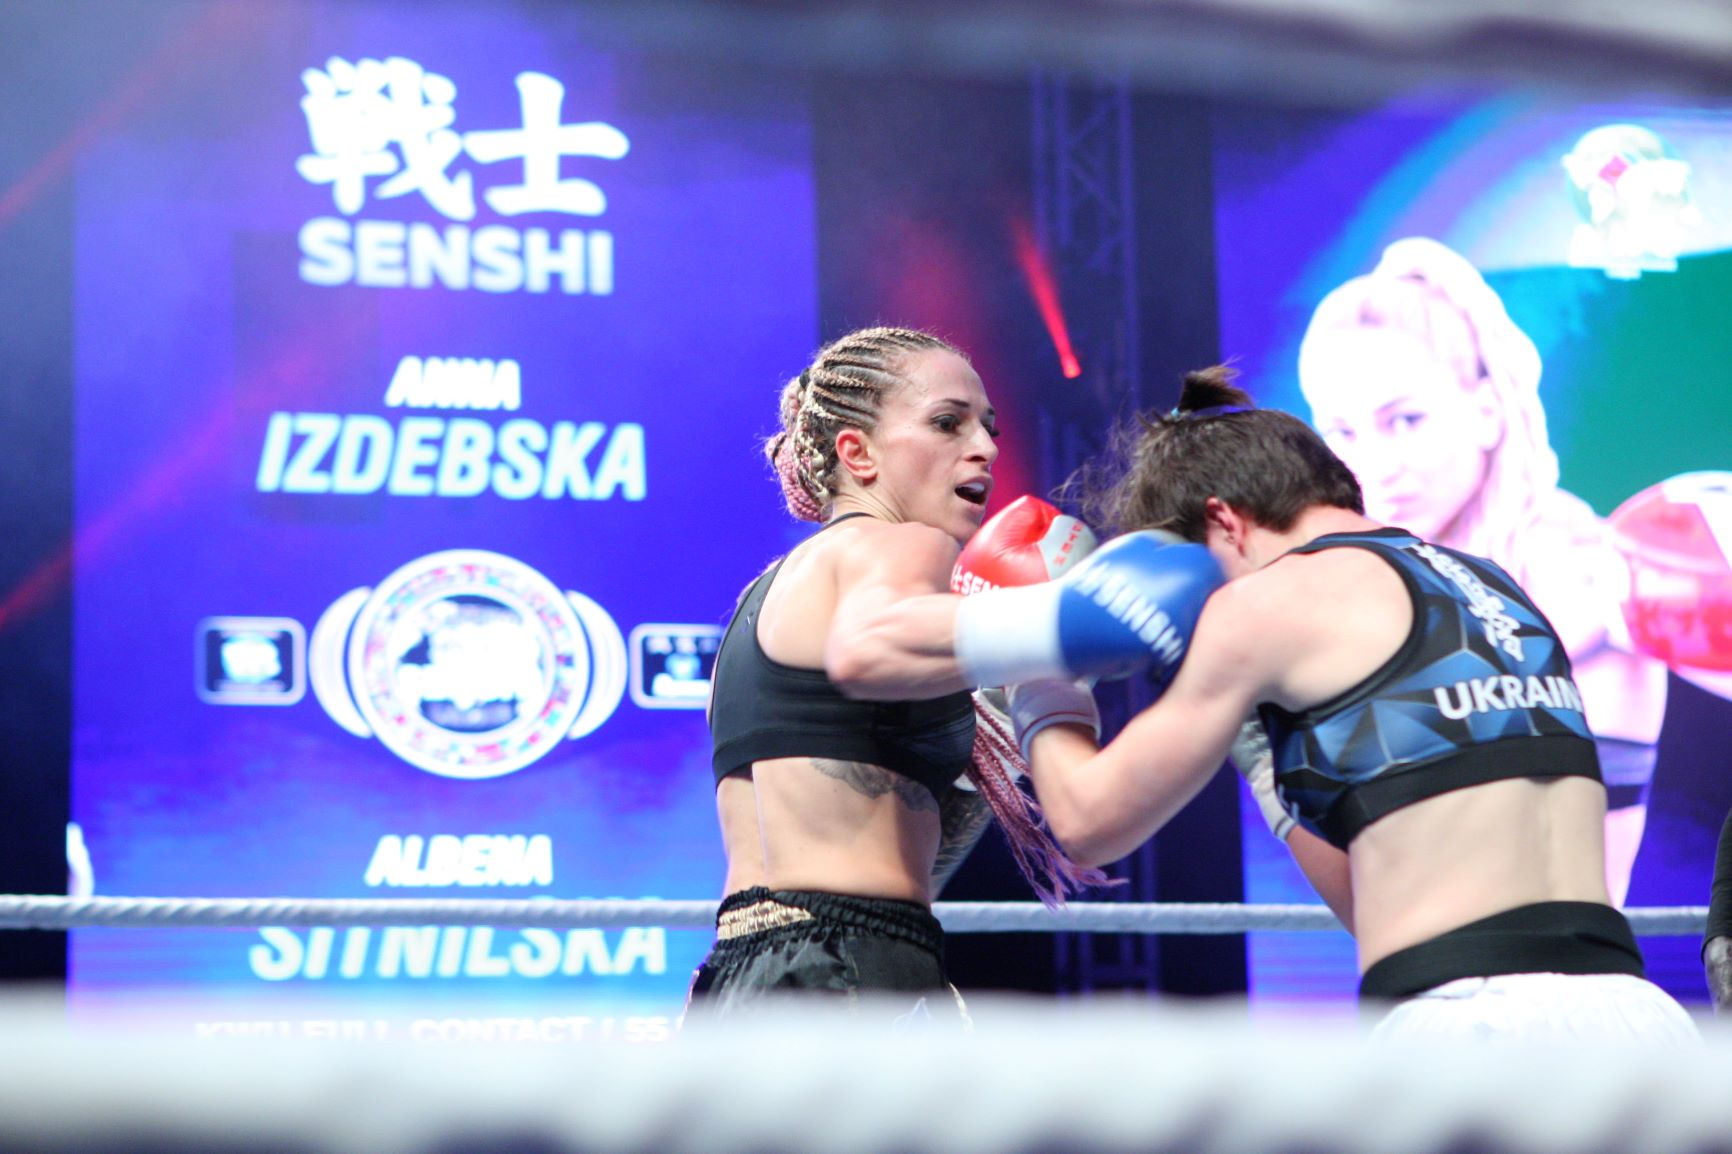 Албена Ситнилска иска мач с Валентина Шевченко